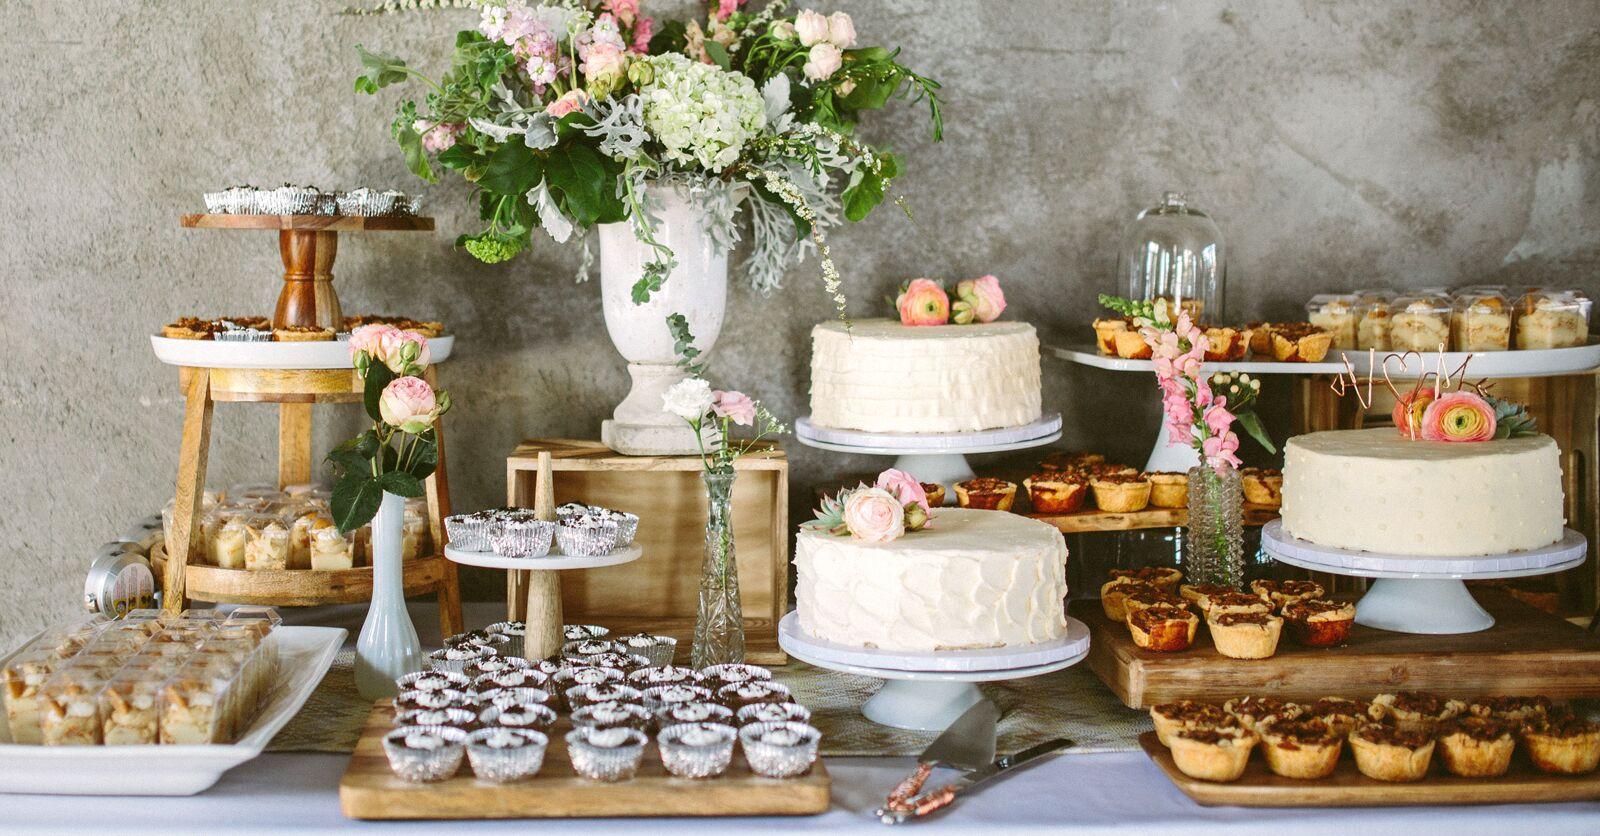 15 Wedding Dessert Table Ideas for Your Wedding Reception